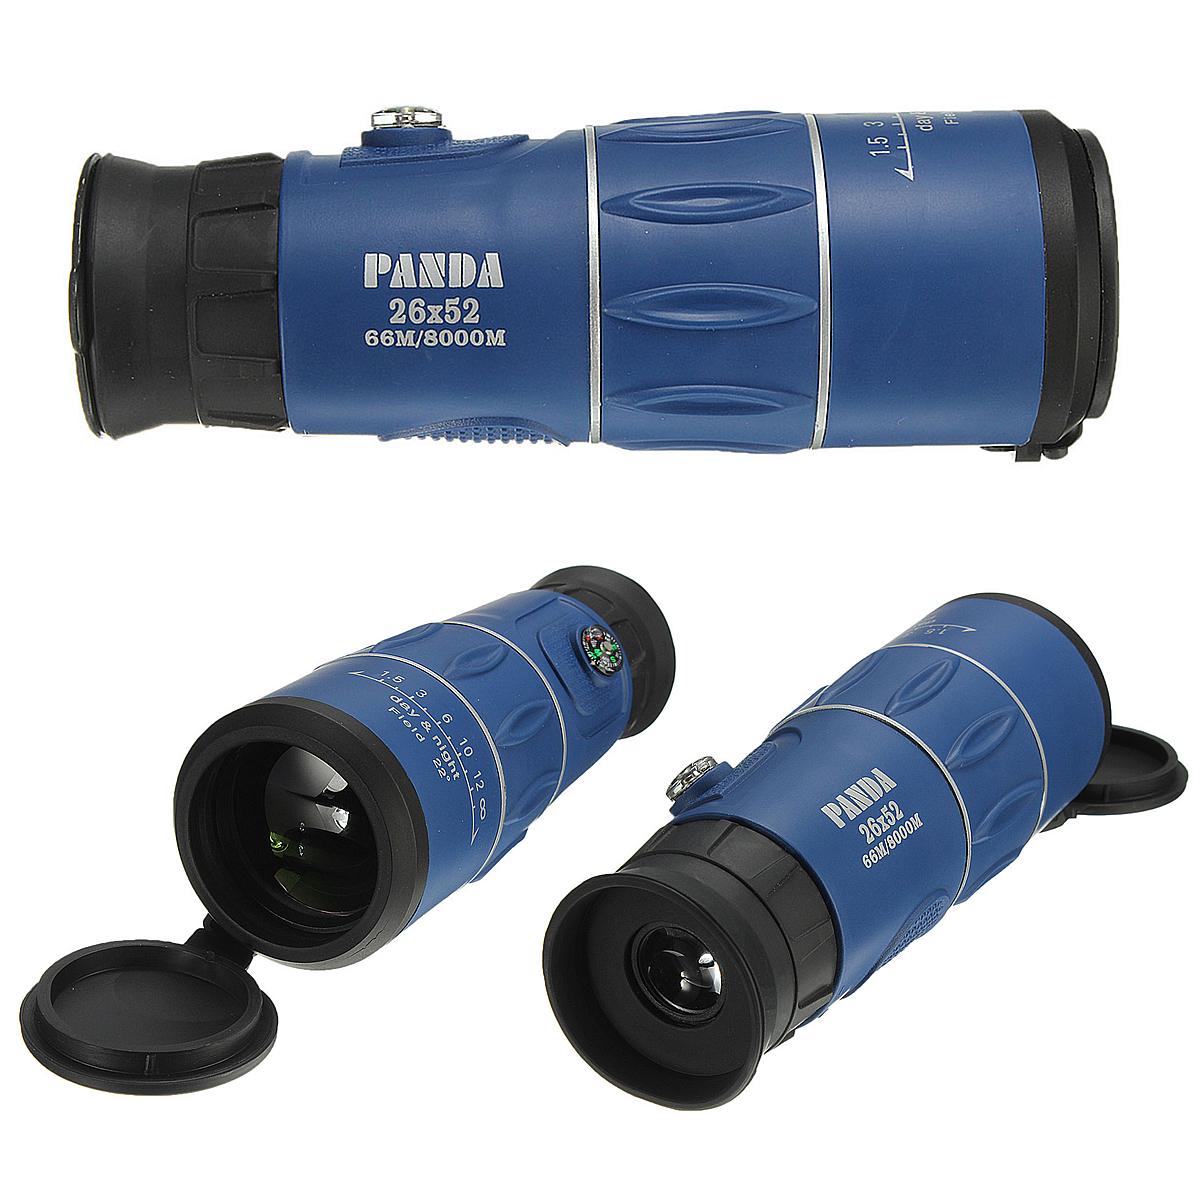 Panda 26x52 66M/8000M HD Clear Zoom Optical Monocular Telescope Hunting Camping